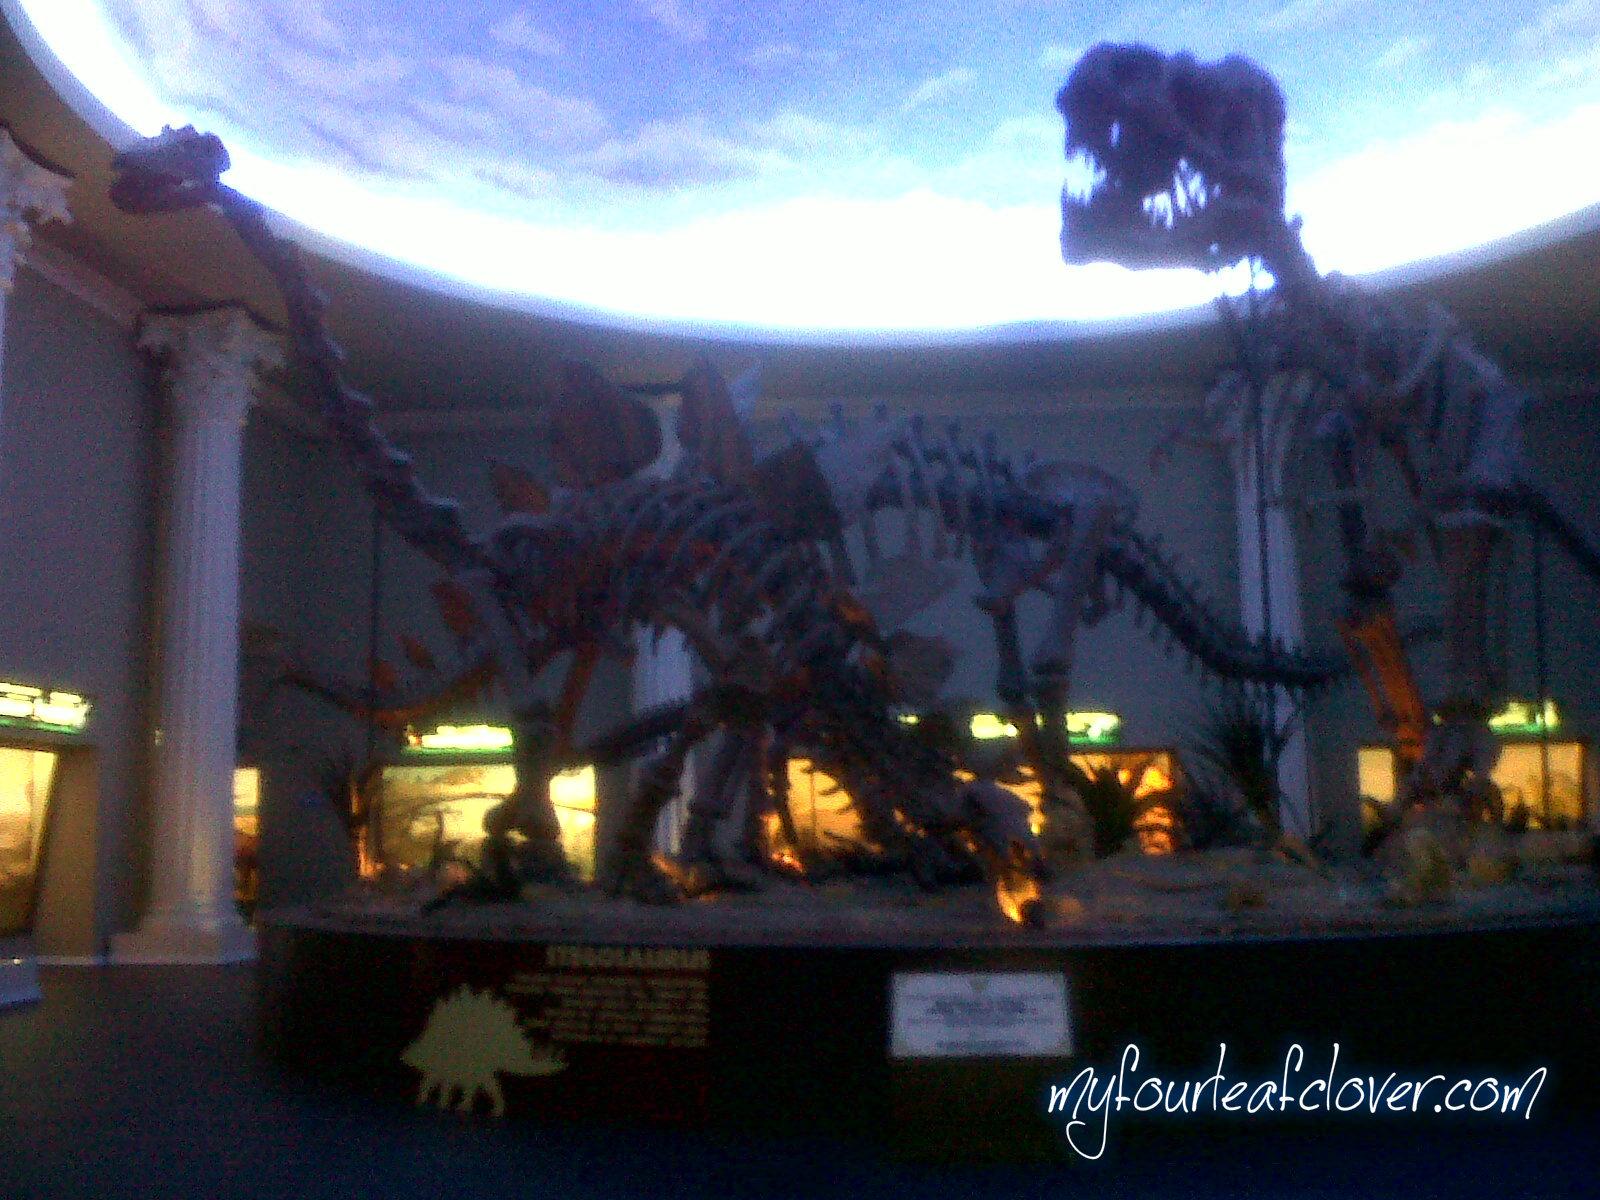 Fosil keluarga Dinosaurus